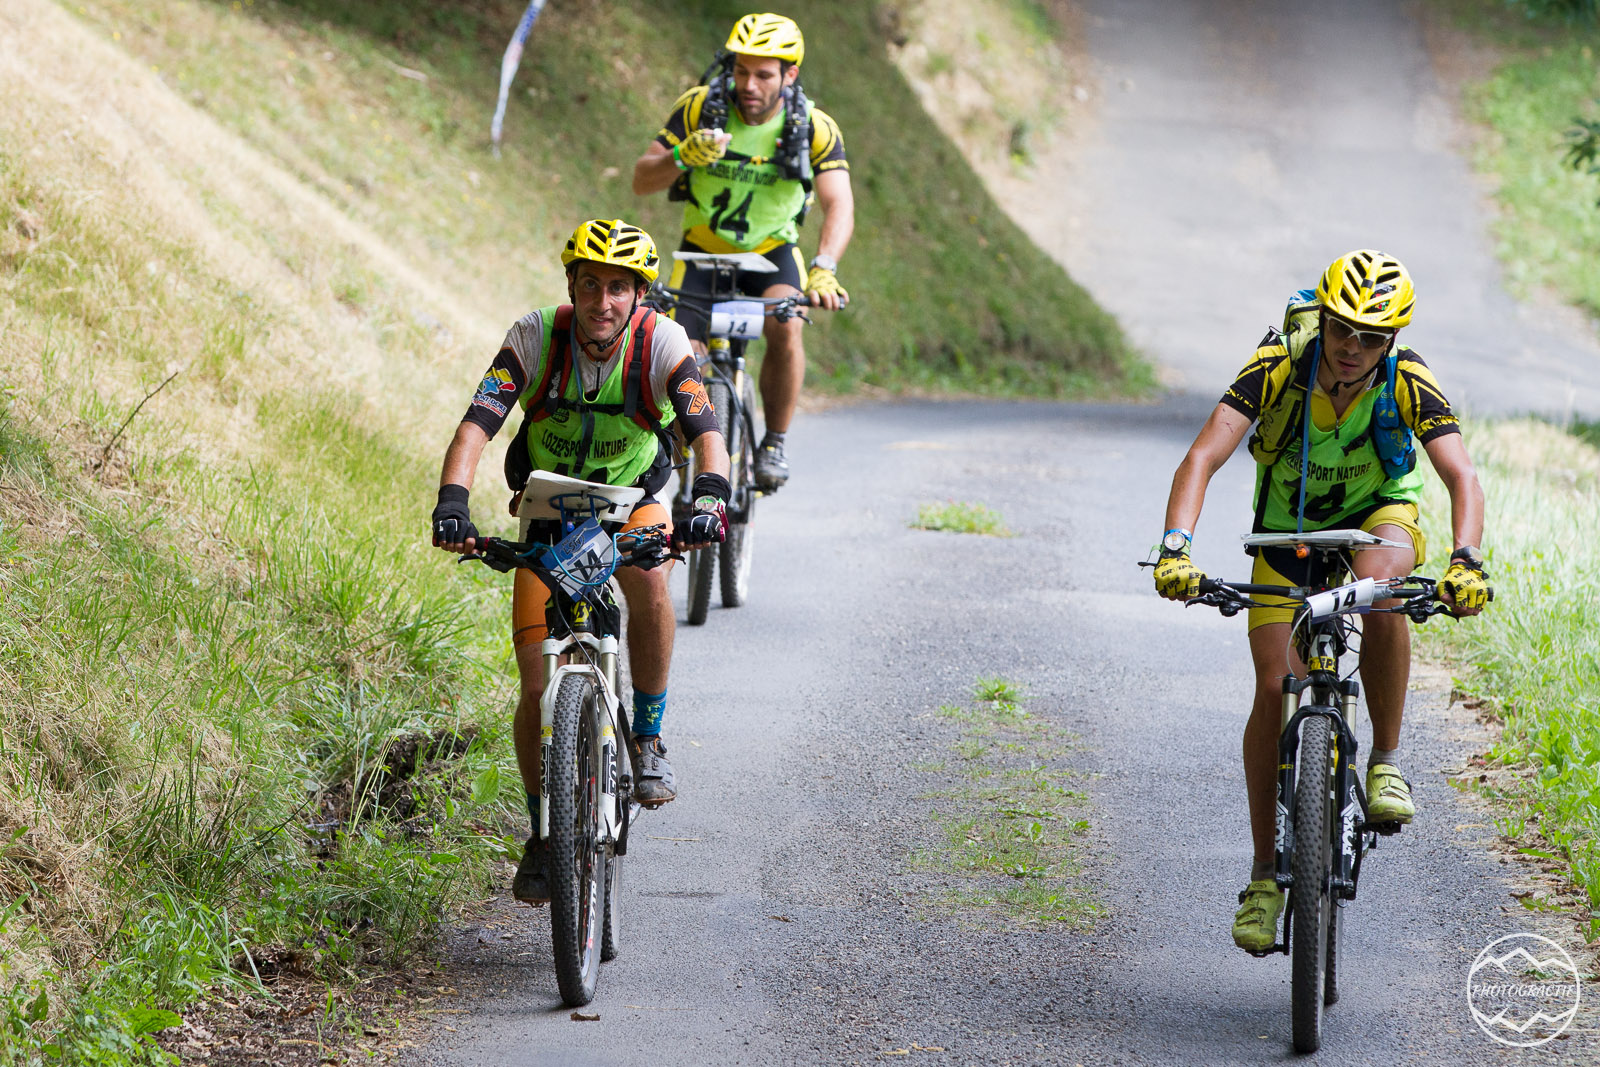 Finale_CFRaid_2017_3_VTT-Trail(20)